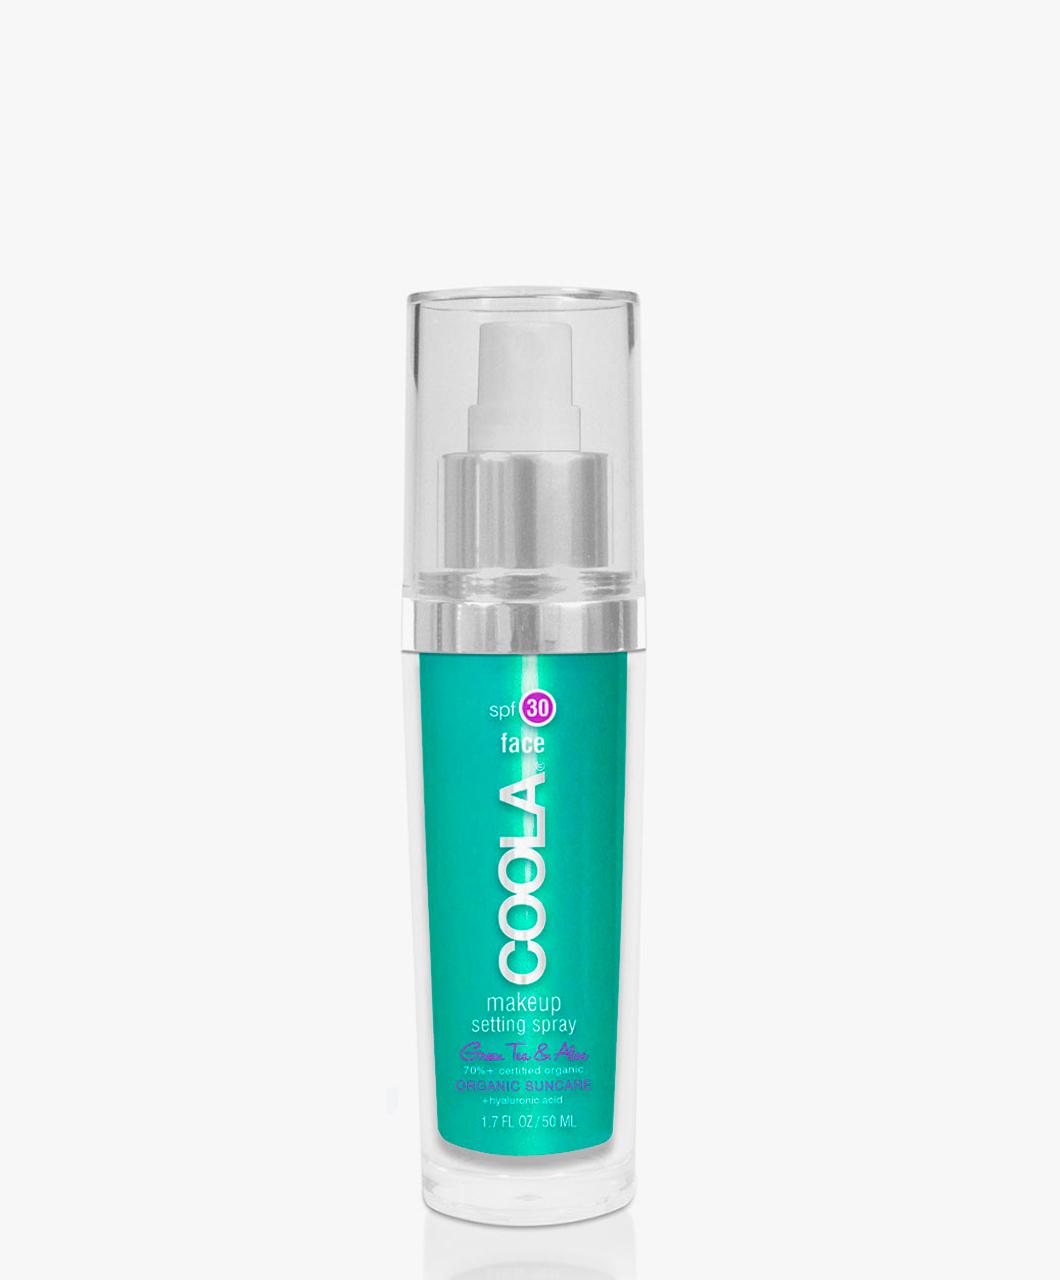 Afbeelding van COOLA Makeup Setting Spray SPF 30 Green Tea